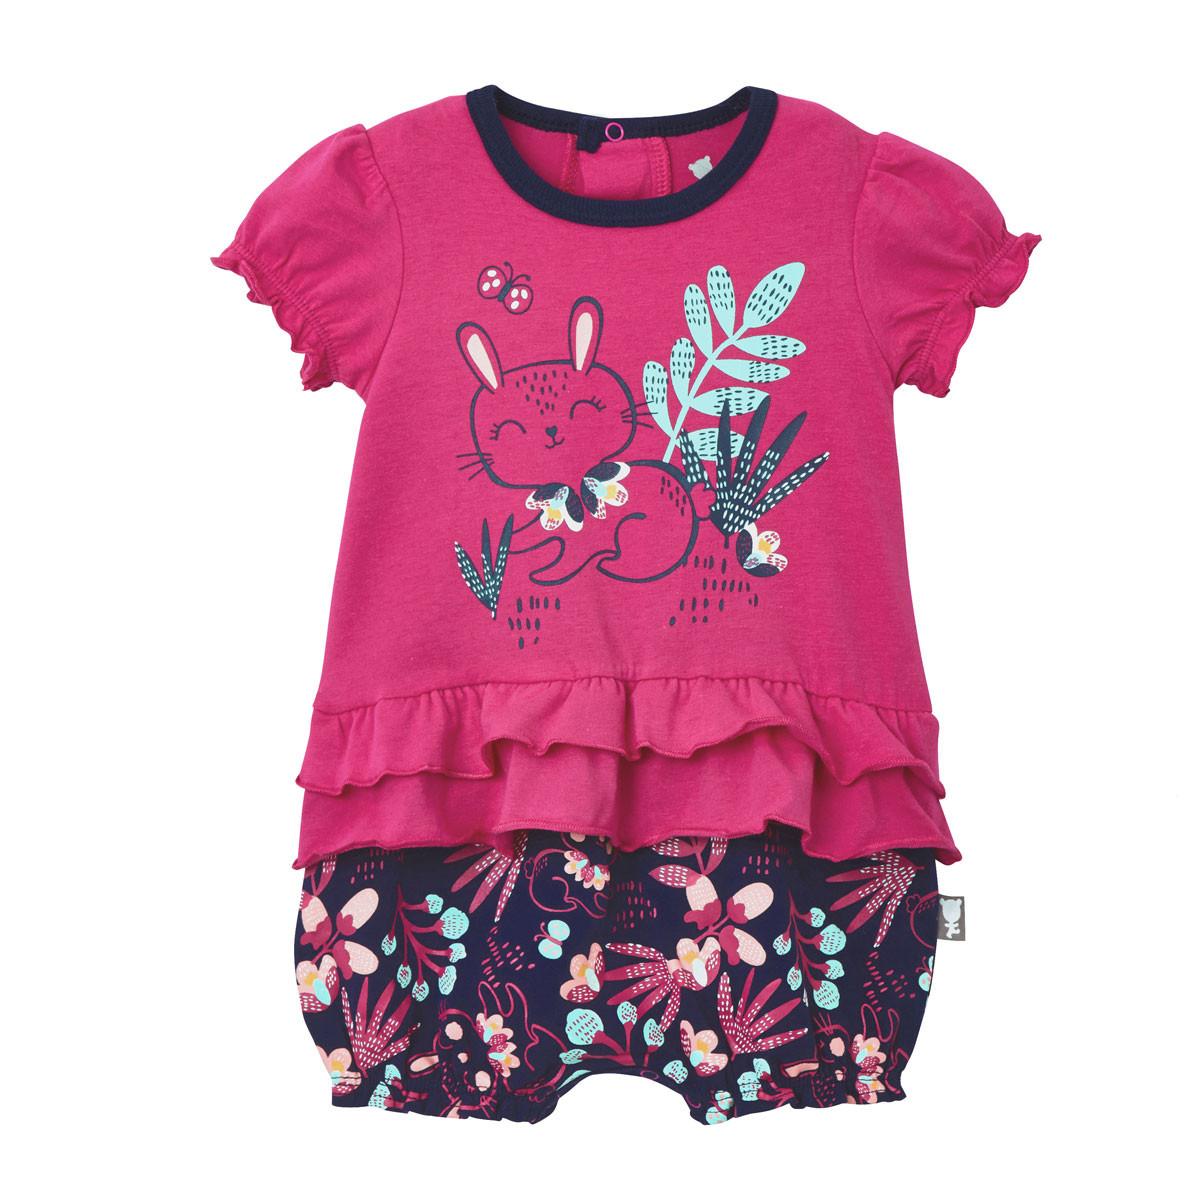 c7f7aee58193b Barboteuse bébé fille Pink Bunny Petit Béguin  Barboteuse bébé fille Pink  Bunny rose ...